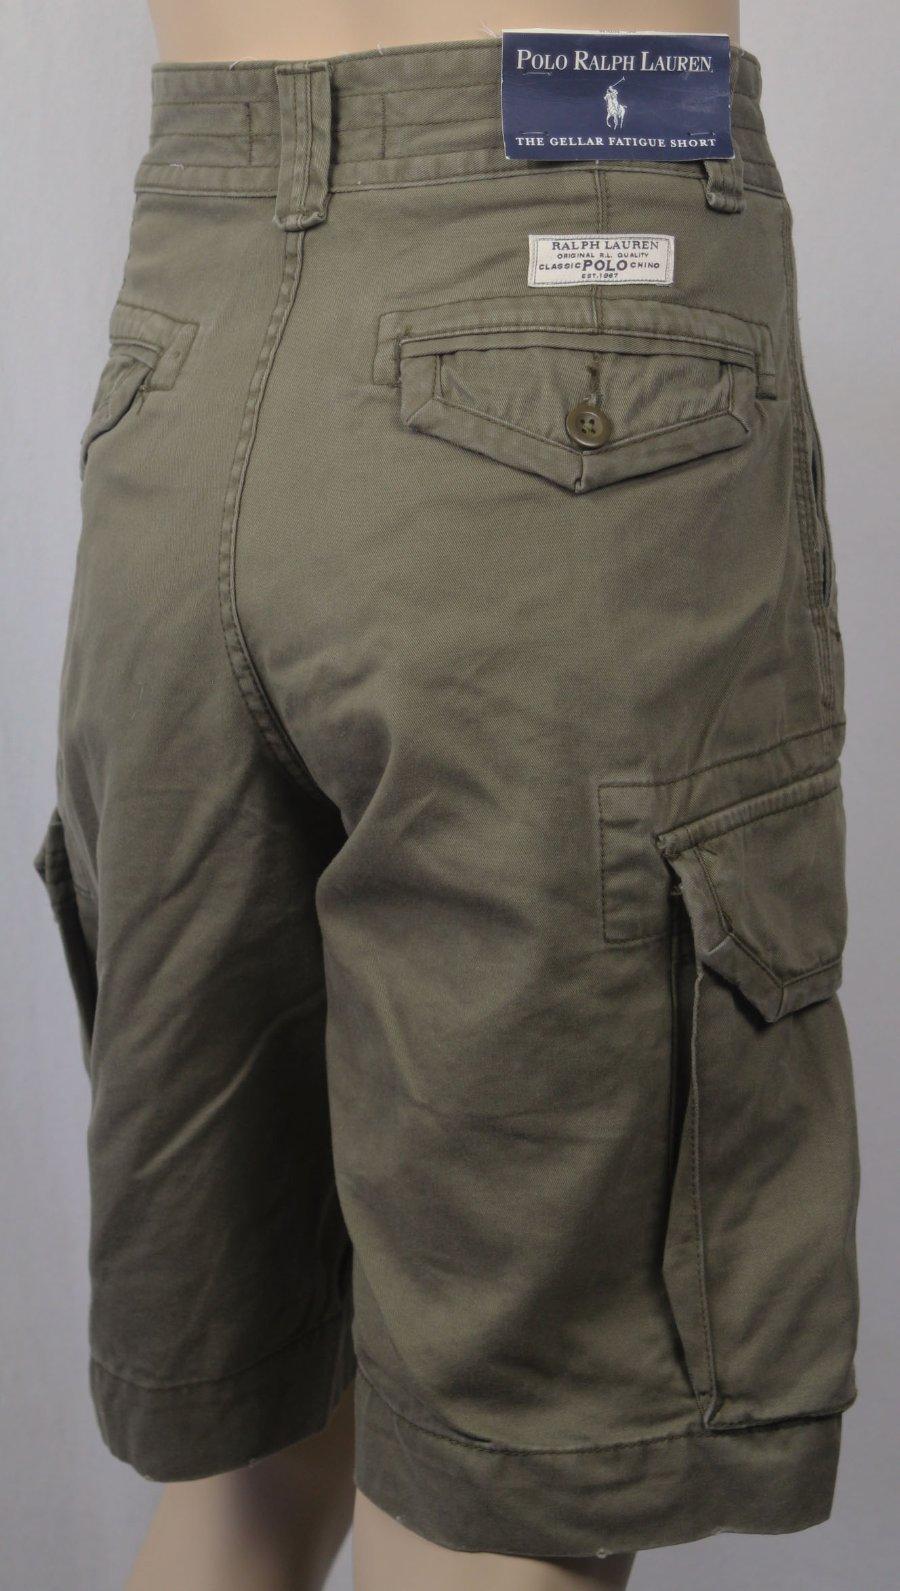 Polo Ralph Lauren Gellar Fatigue Cargo Military Army Classic Chino Shorts Big